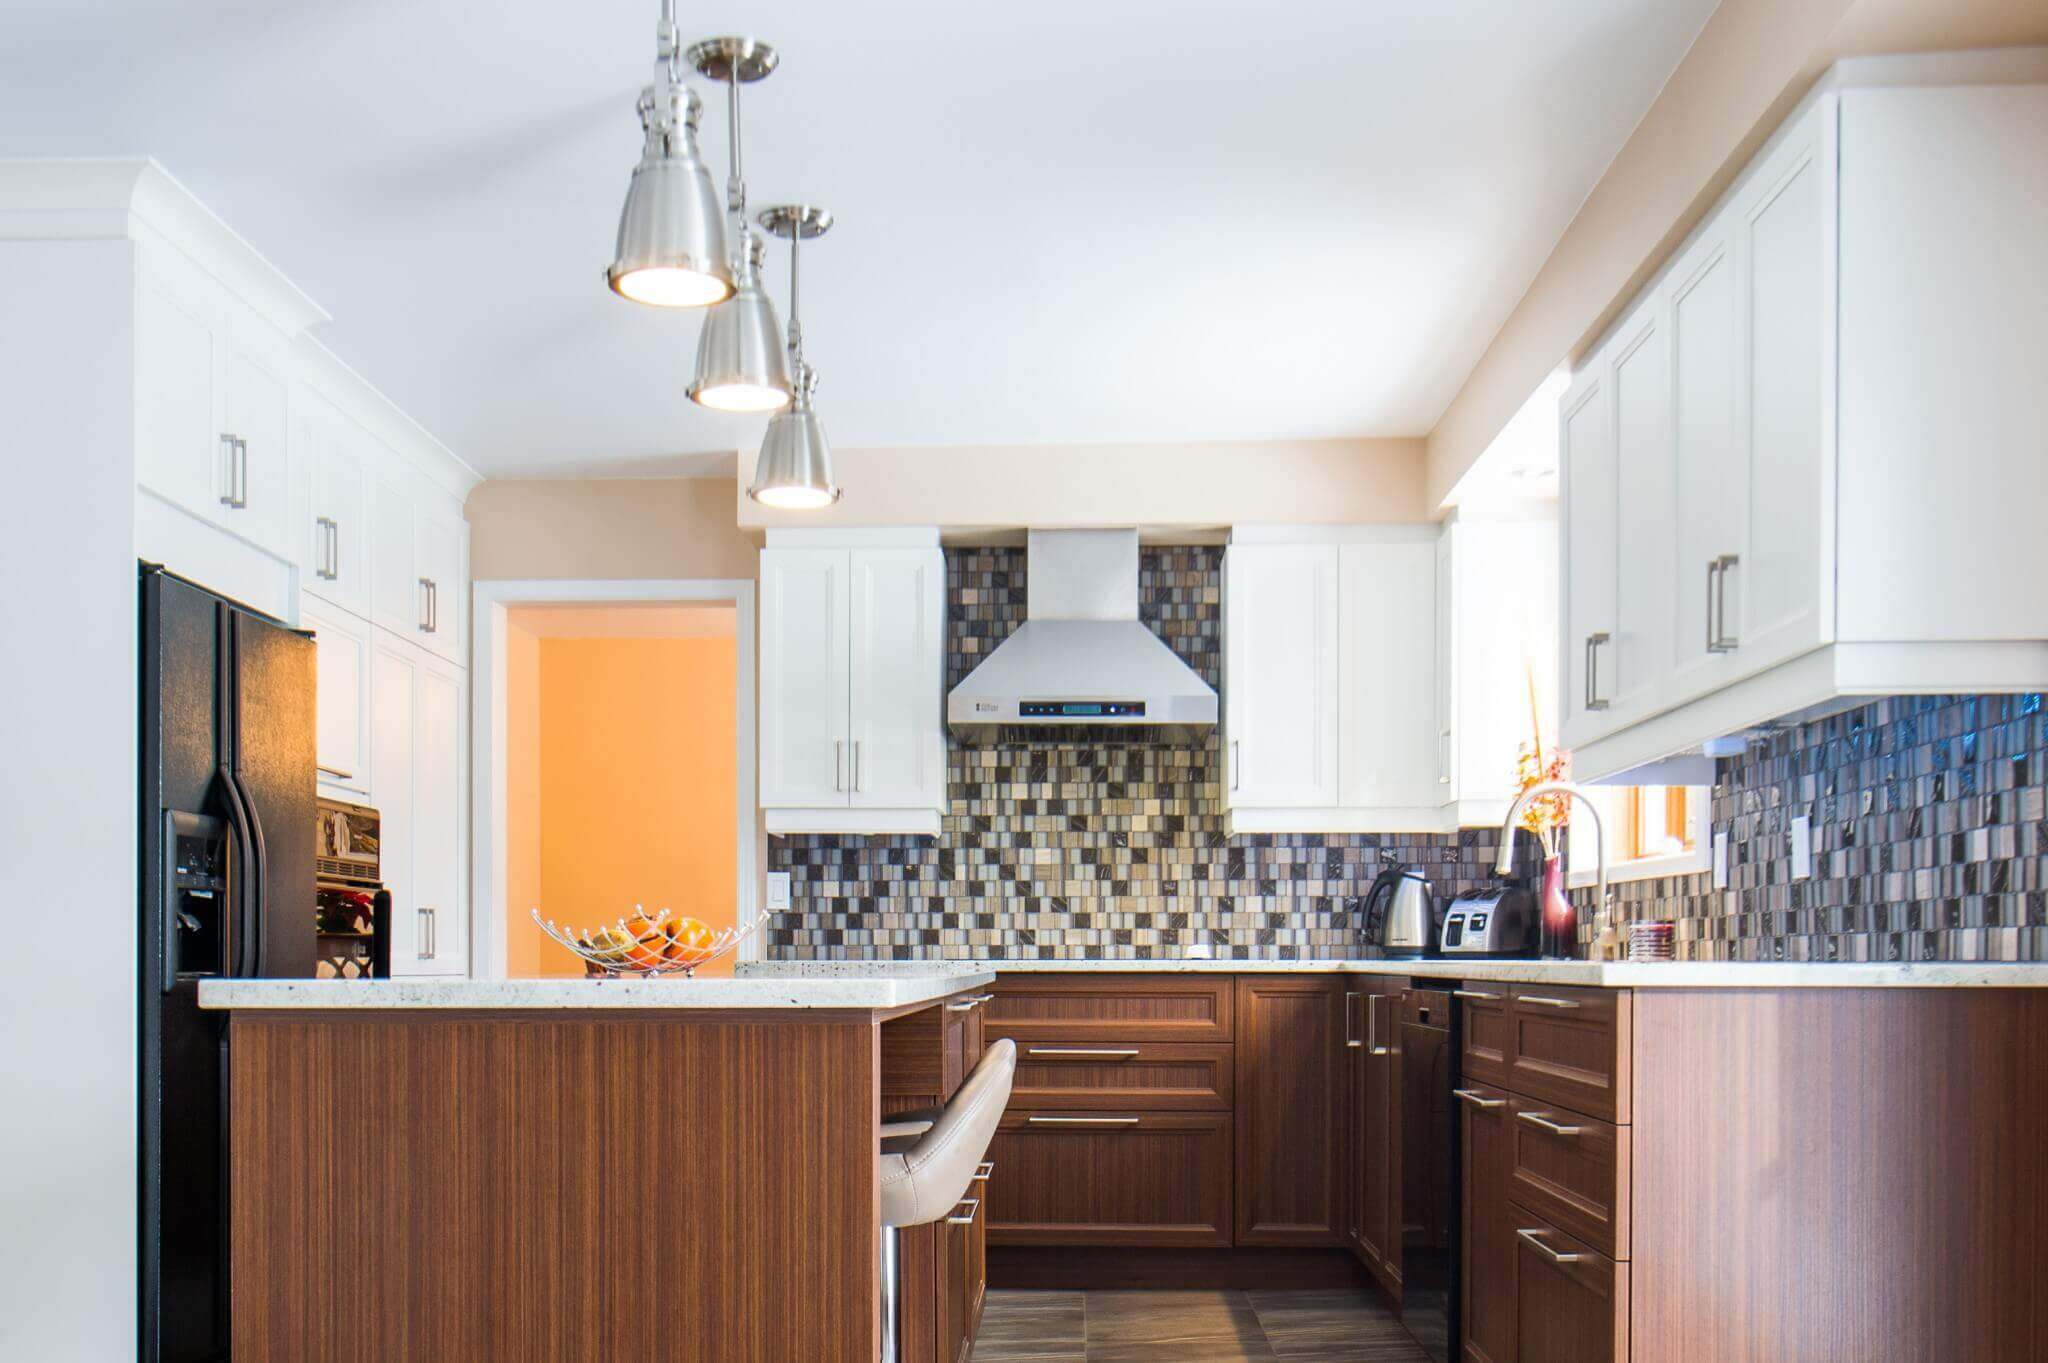 Cuisine moderne avec comptoirs et armoires brunes